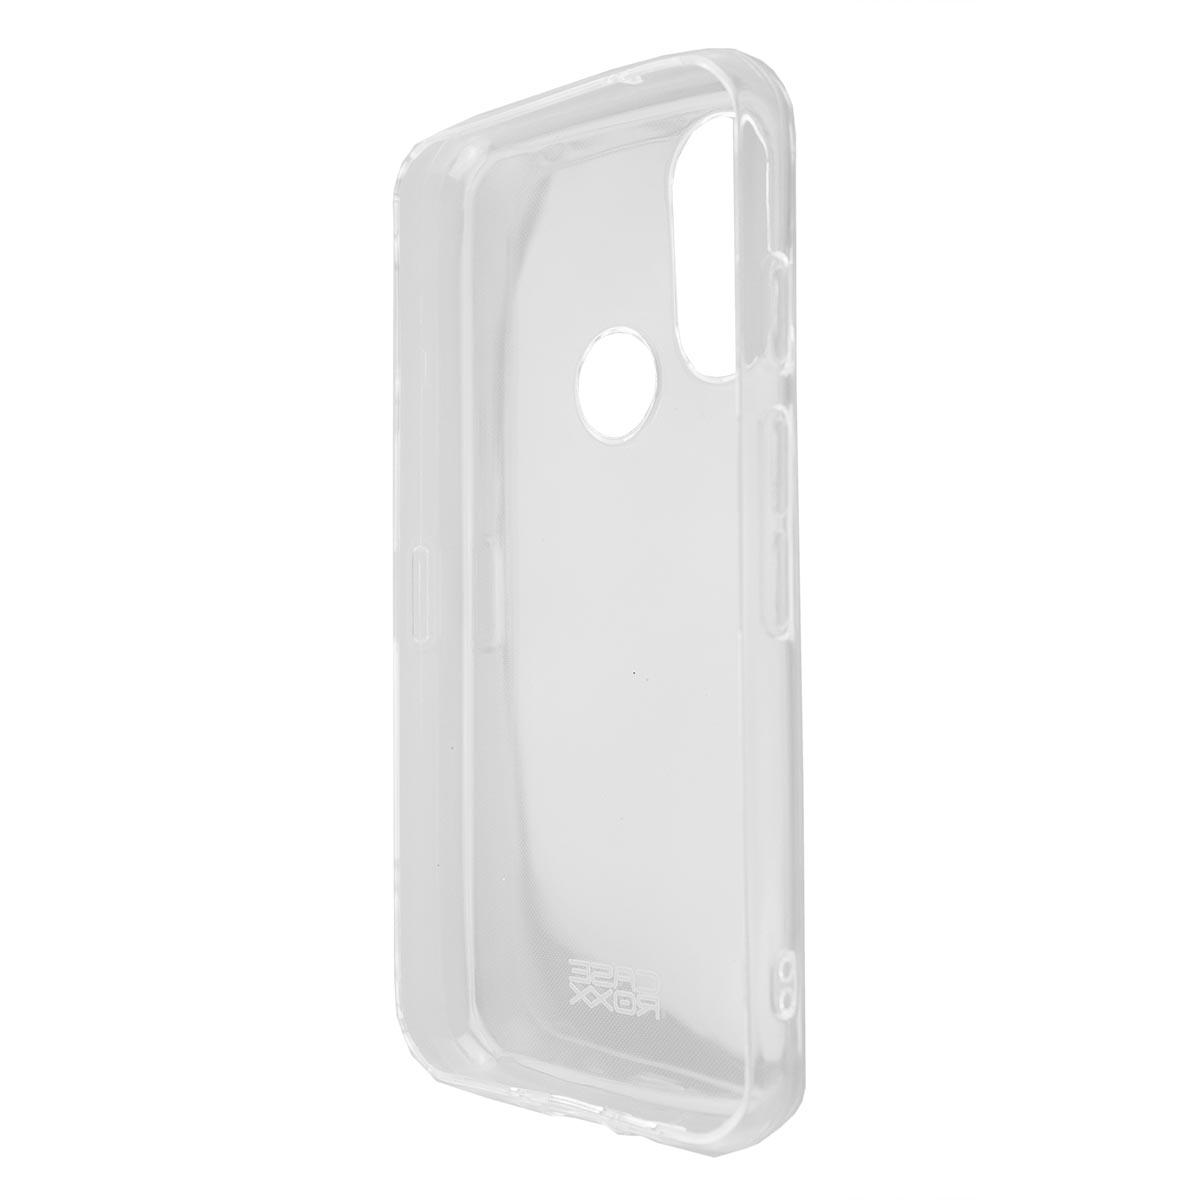 Caseroxx-TPU-Case-pour-Cat-S62-Pro-fait-de-TPU miniature 28